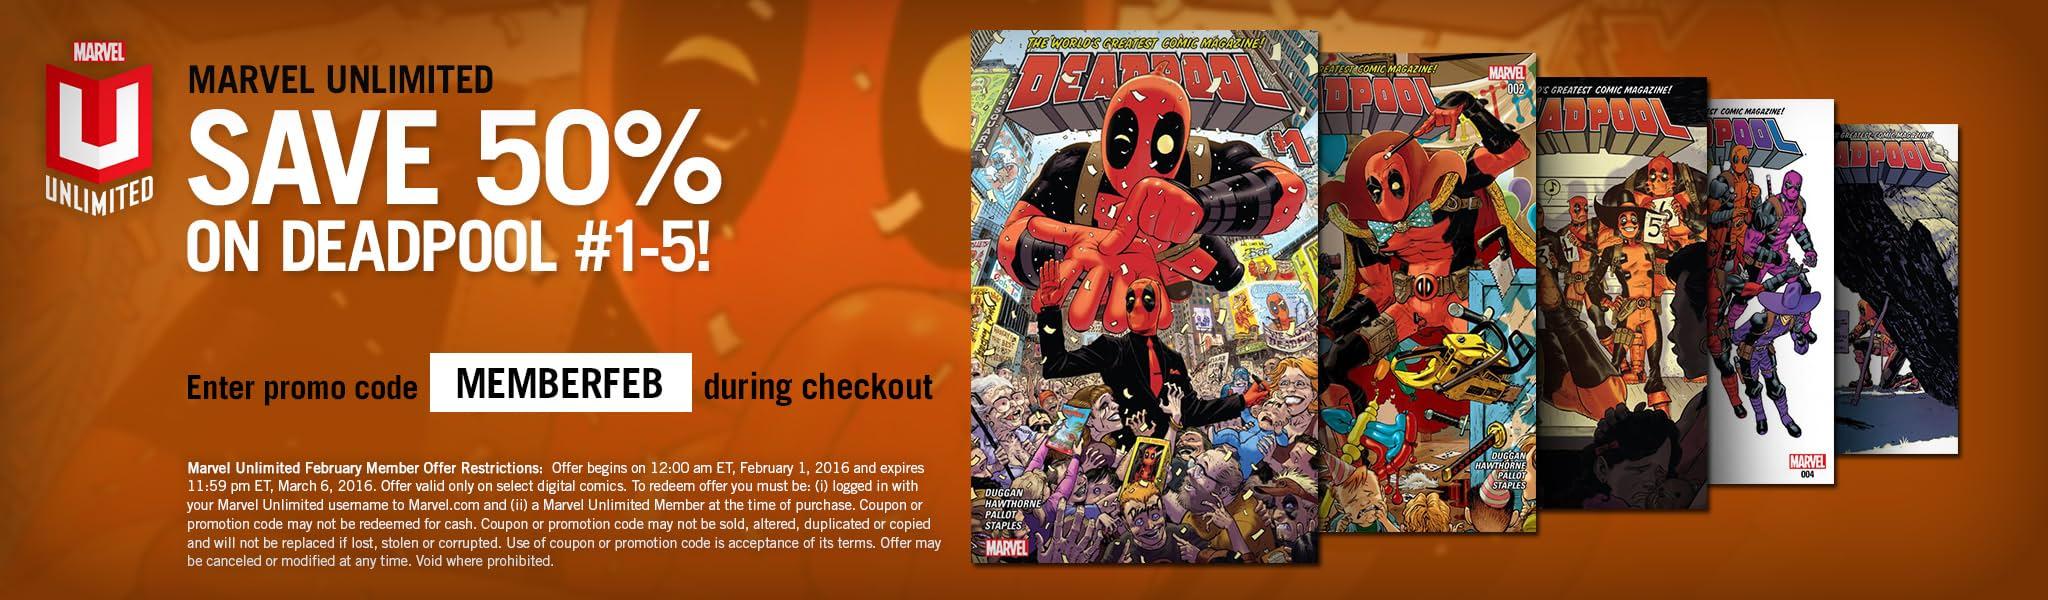 marvel unlimited spotlight offer february 2016 marvel comics